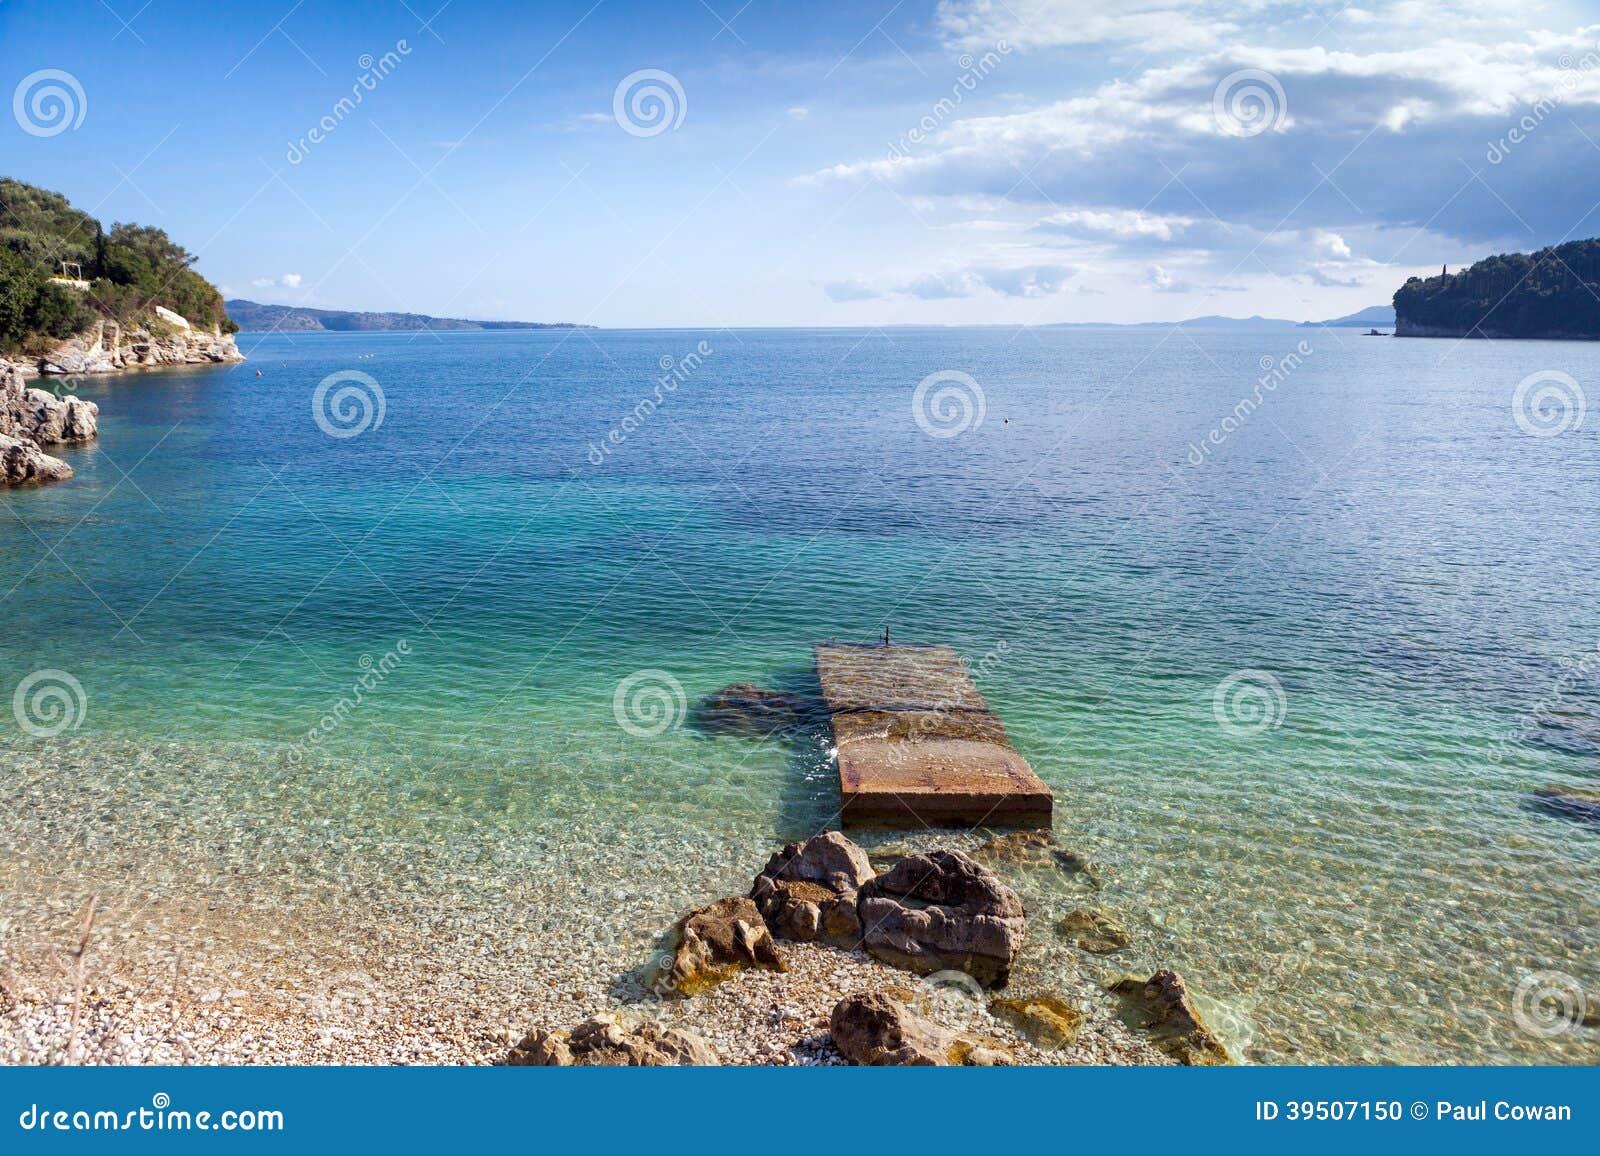 Kalami Bay view